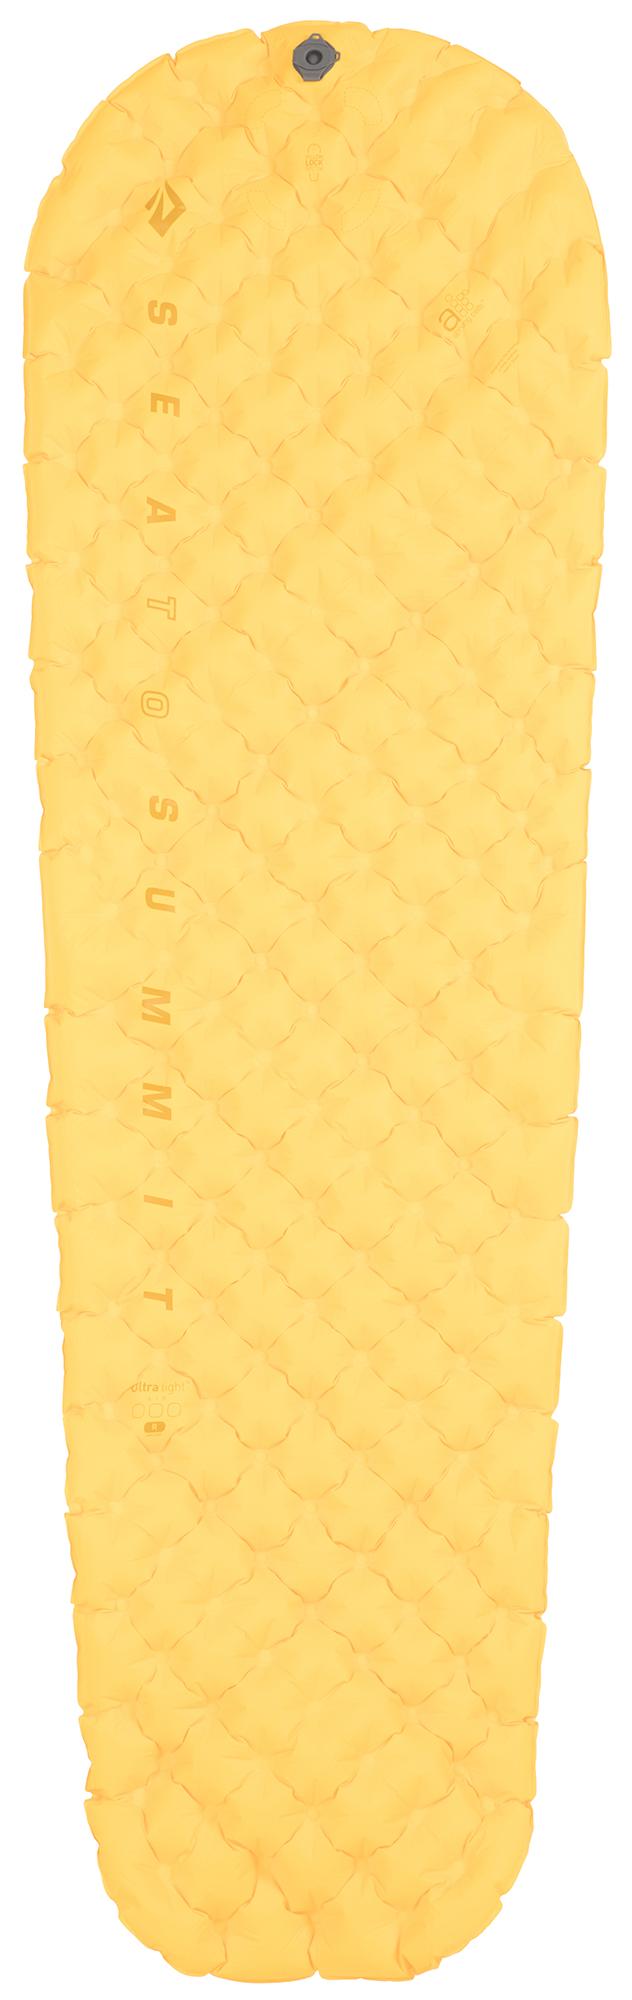 SEA TO SUMMIT Коврик надувной SEA TO SUMMIT UltraLight Mat Regular комплектующие для спортивных сумок sea to summit 56928afrb25spp 2015 afrb25srpp